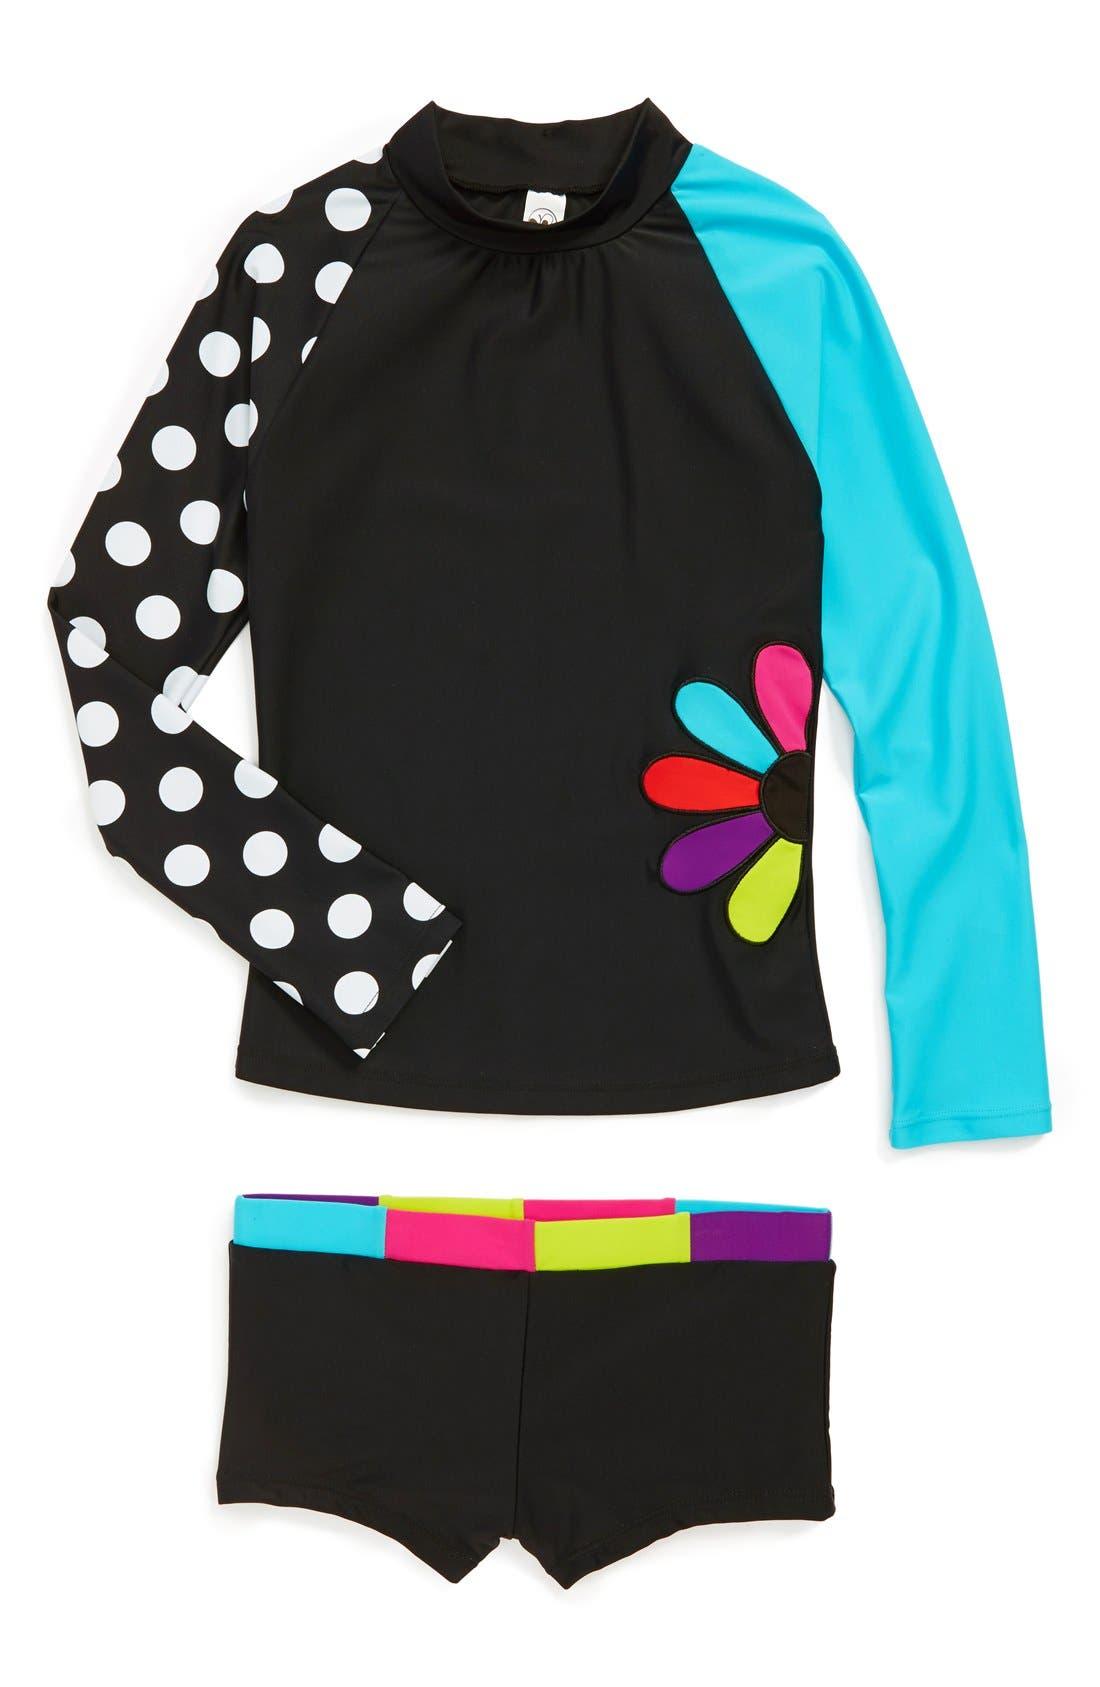 Alternate Image 1 Selected - Limeapple Two-Piece Rashguard Swimsuit (Little Girls & Big Girls)